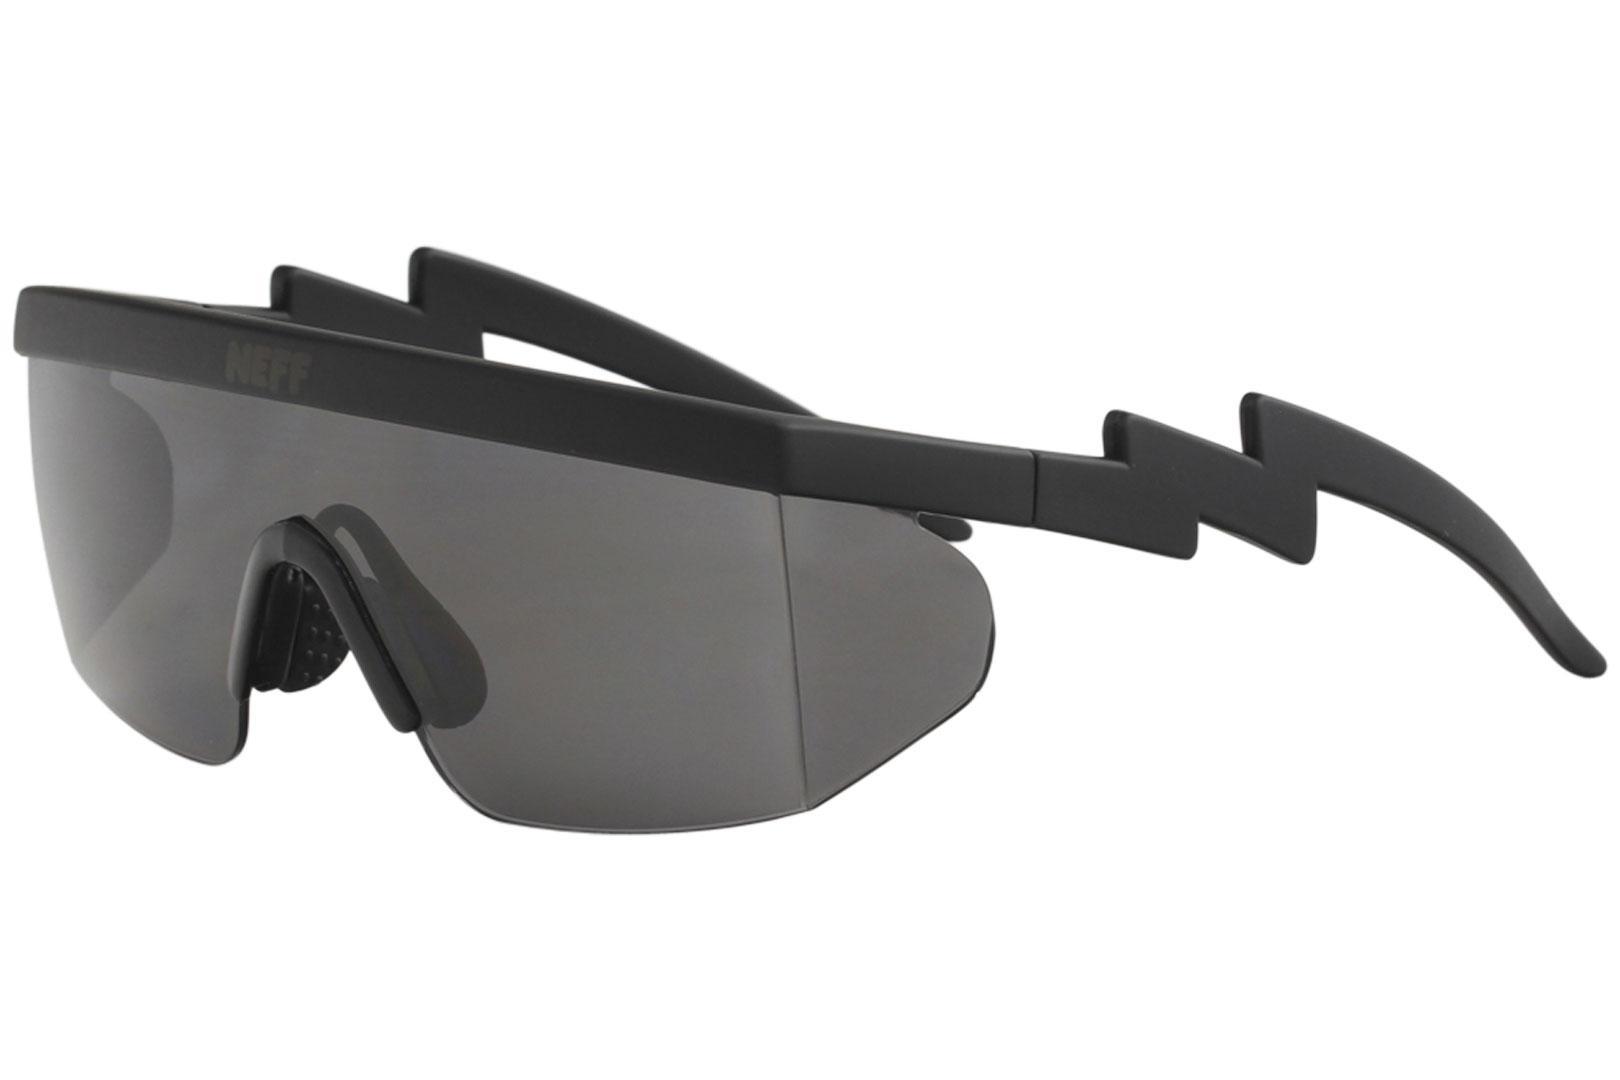 Image of Neff Brodie NF0304 NF/0304 Sunglasses W/ Bonus Lens - Black Rubber/Grey - Medium Fit